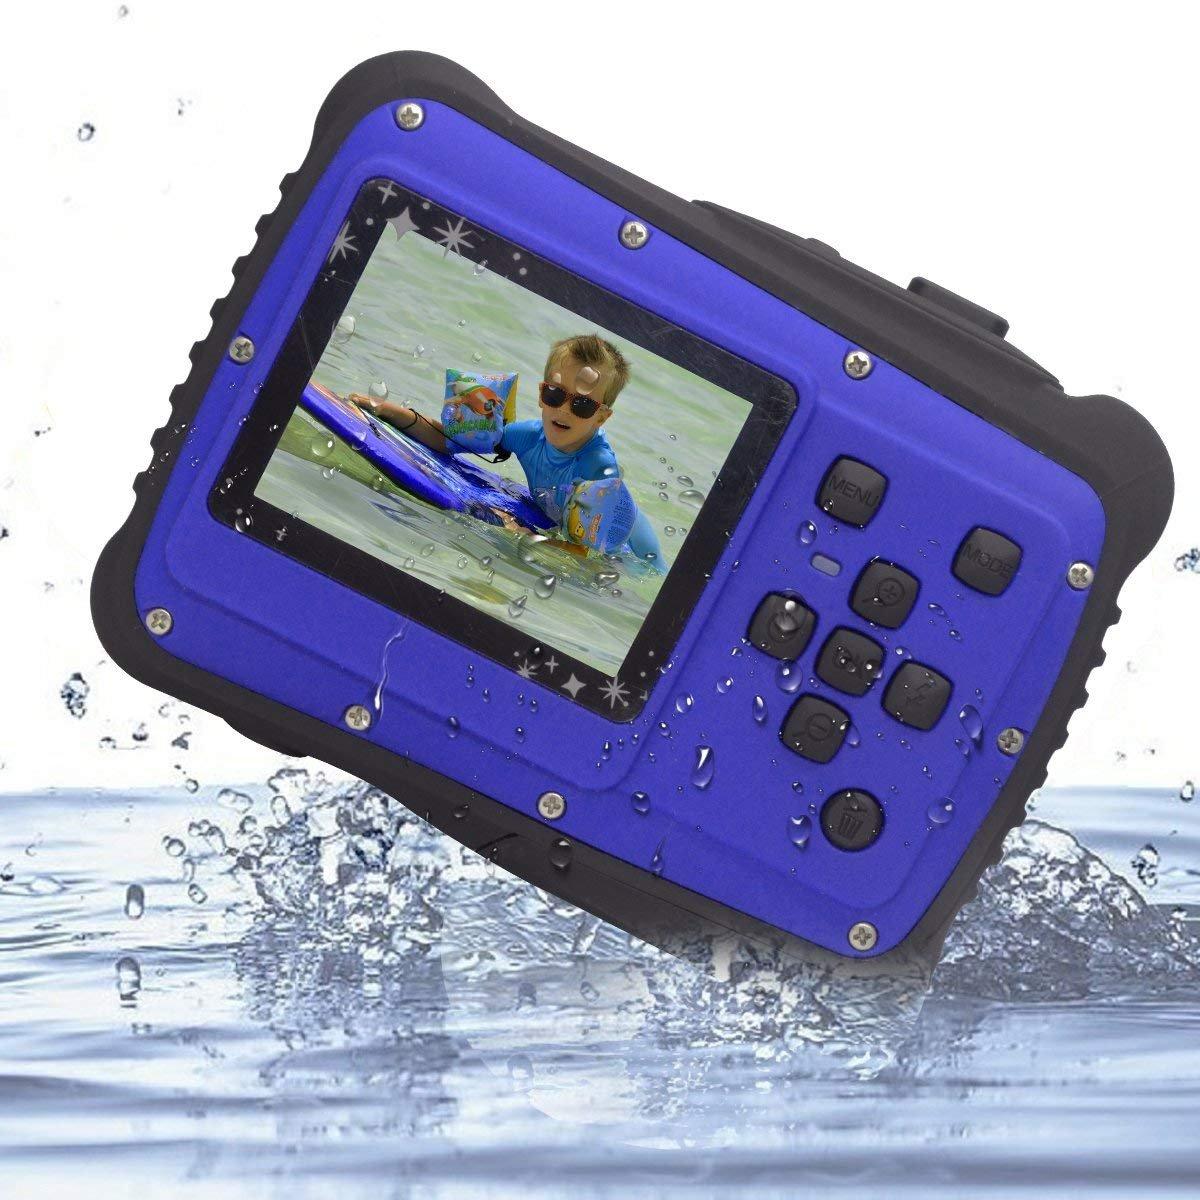 Waterproof Digital Camera for Kids, Vmotal Waterproof Camera for Kids with 2.0 Inch LCD Display, 8x Digital Zoom, Flash For Children Boys Girls Gift Toys (Blue)